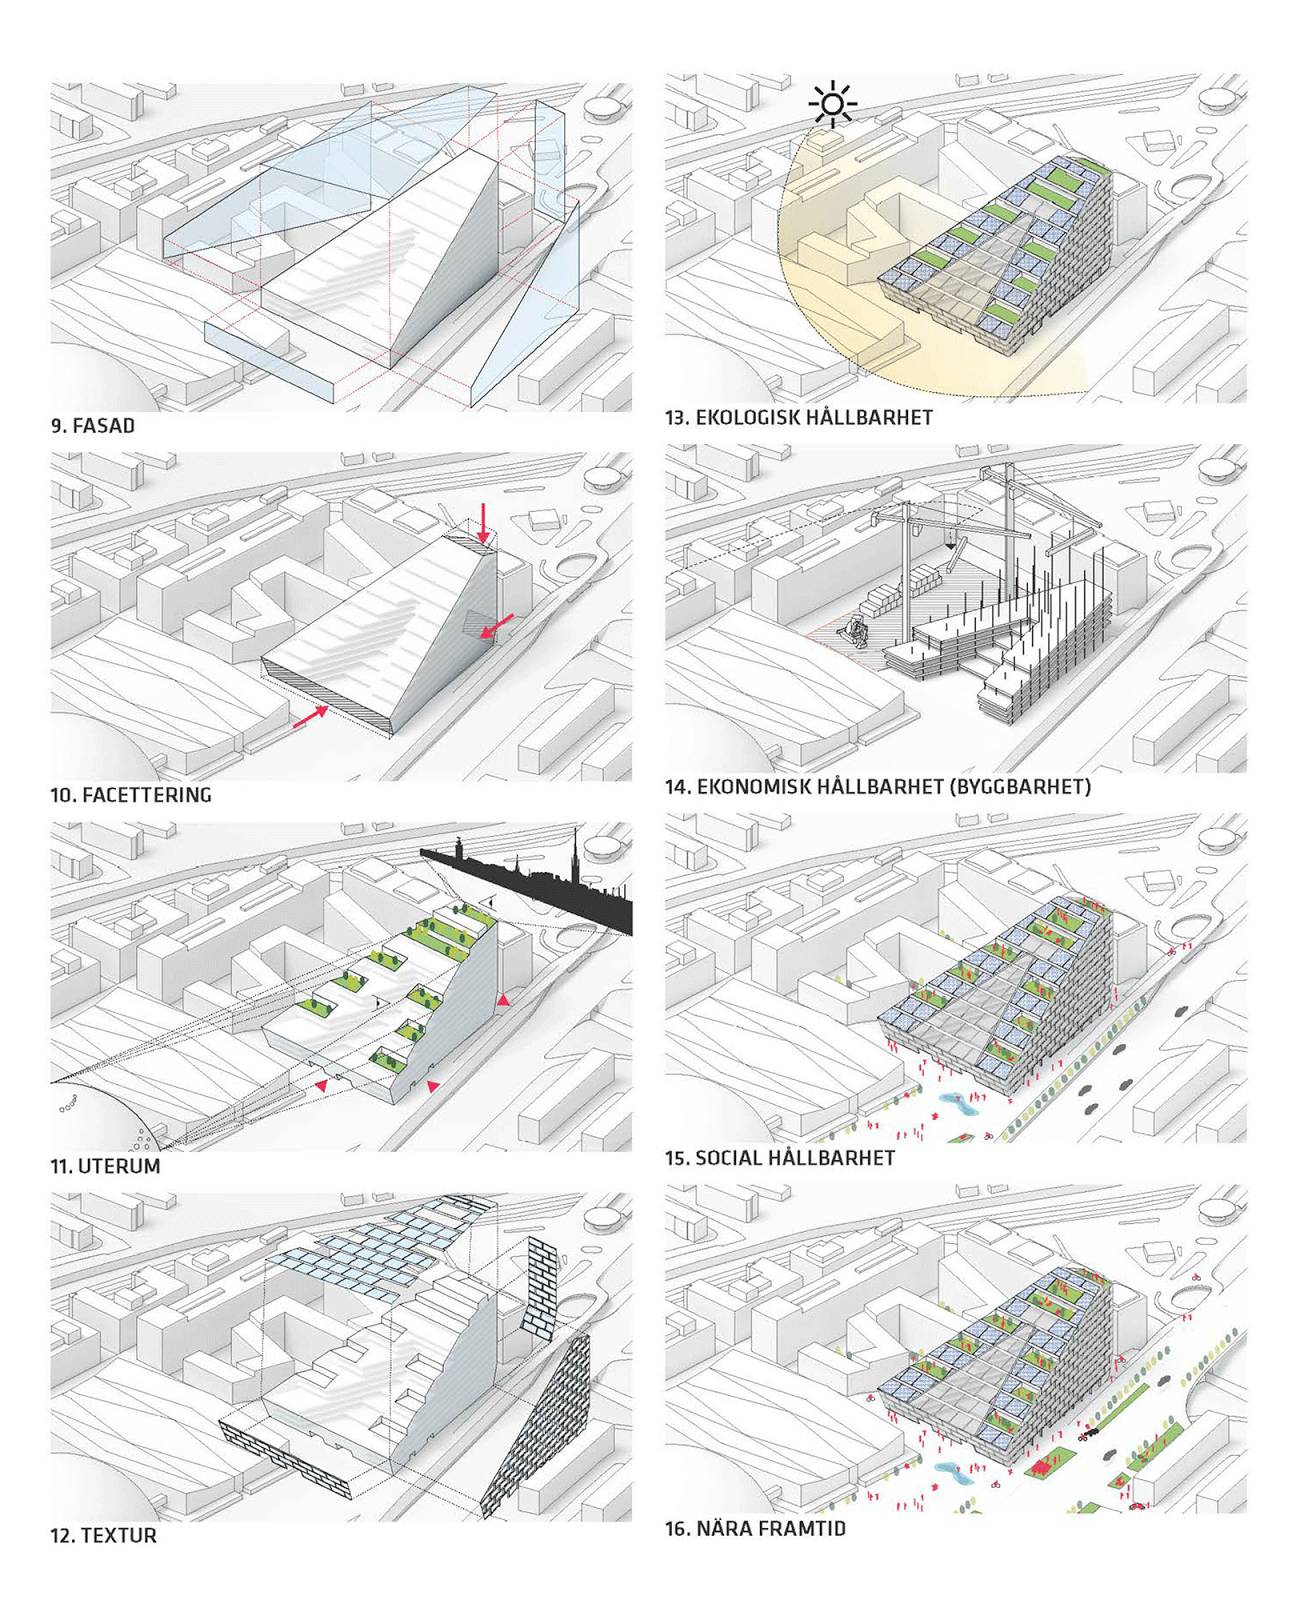 BIG+.+new+municipal+building+.+Stockholm+(13).png 1.292×1